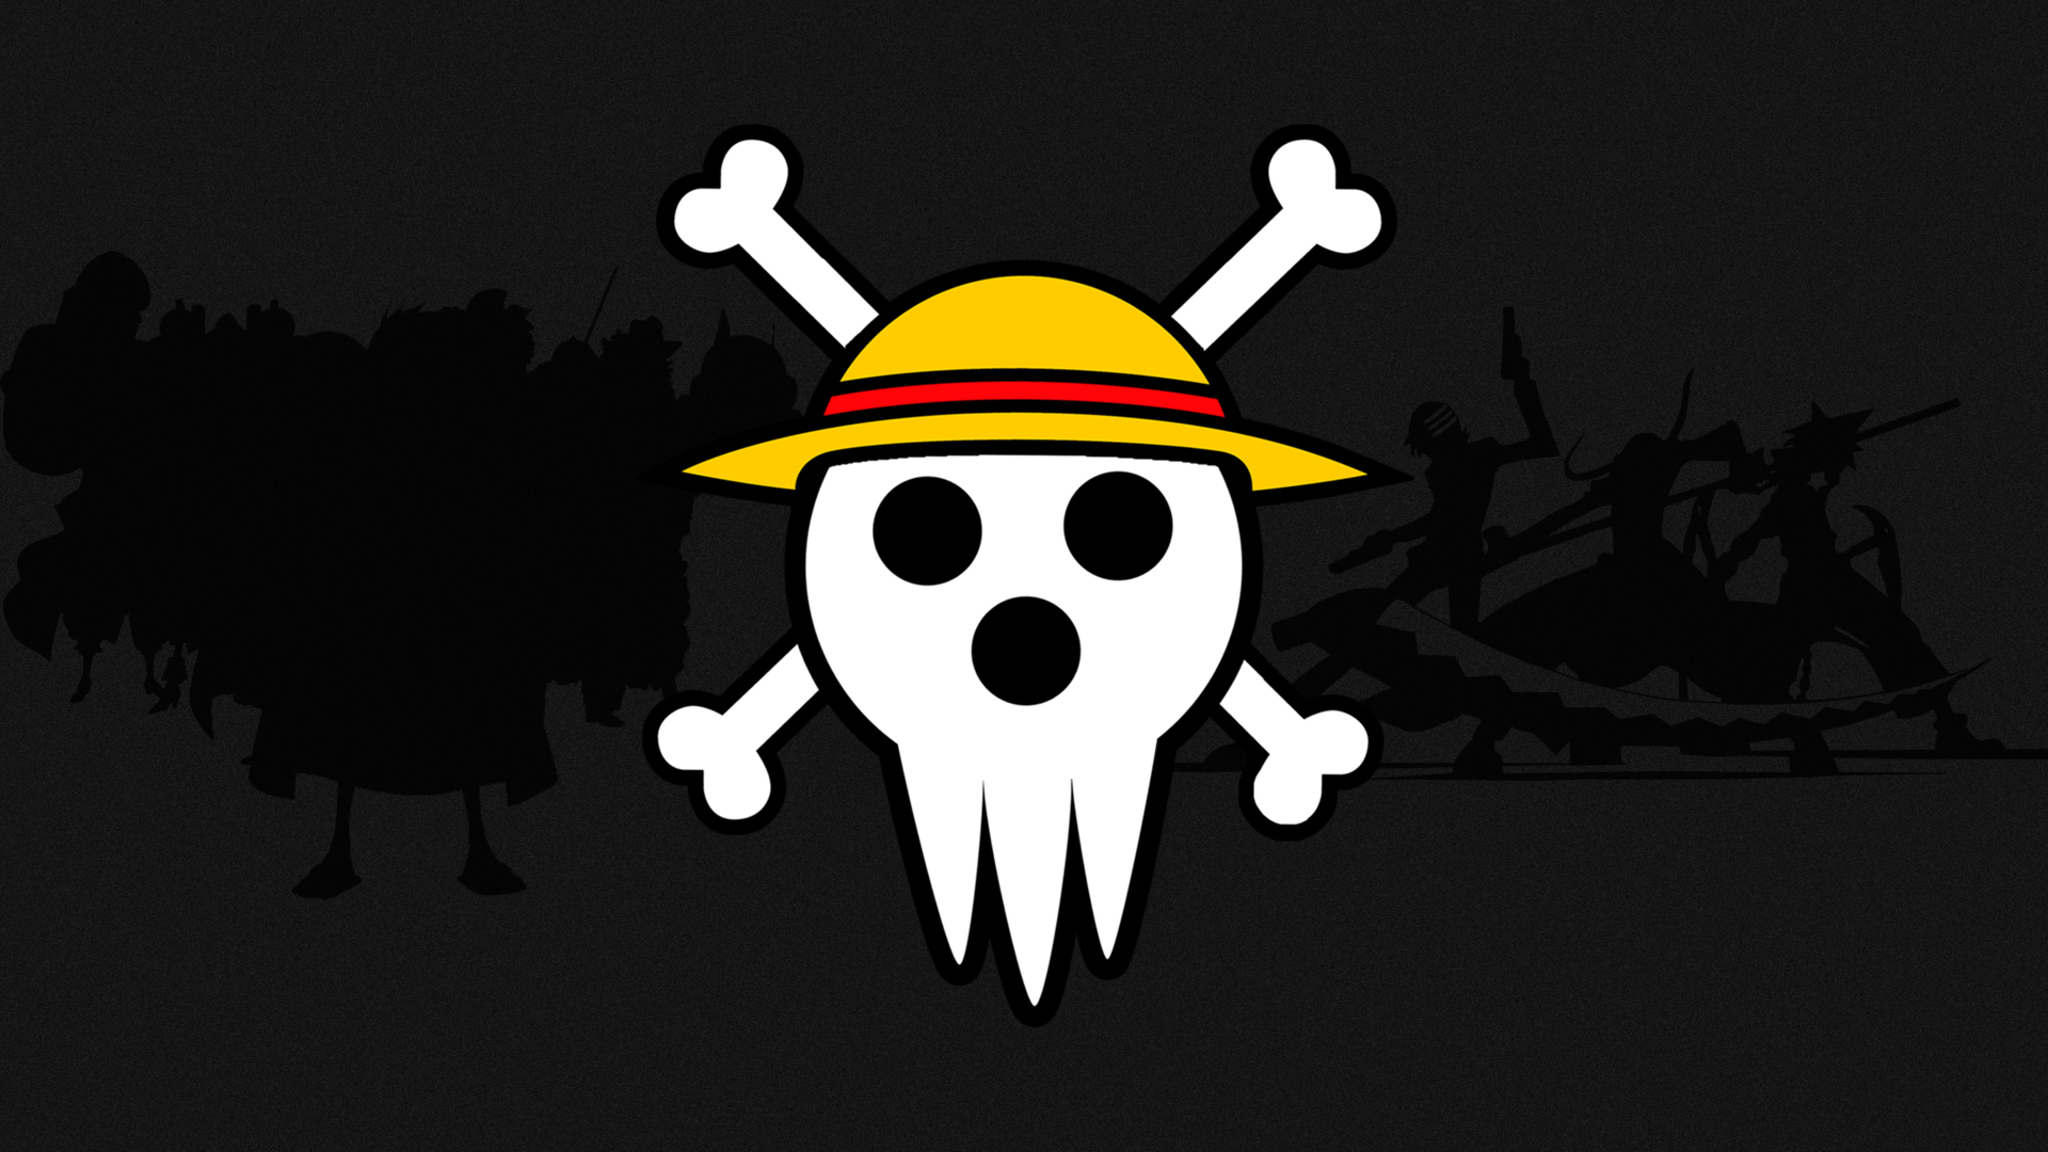 2048x1152 One Piece Anime Art Logo 2048x1152 Resolution HD ...